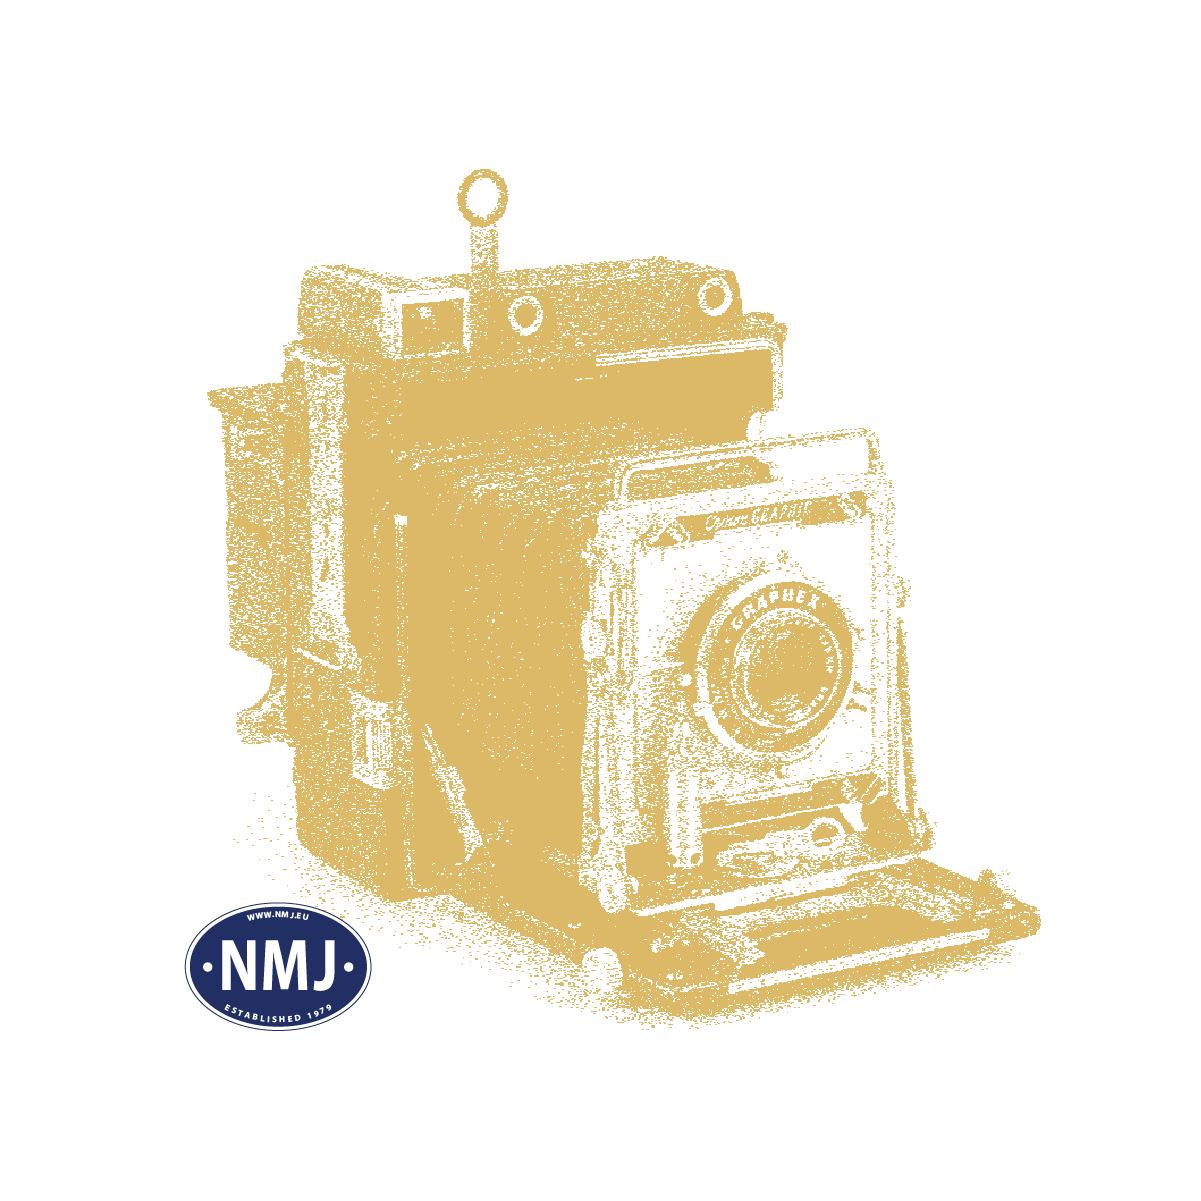 "NMJT90212 - NMJ Topline MAV M61 019 ""Classic"", DCC w/ Sound"